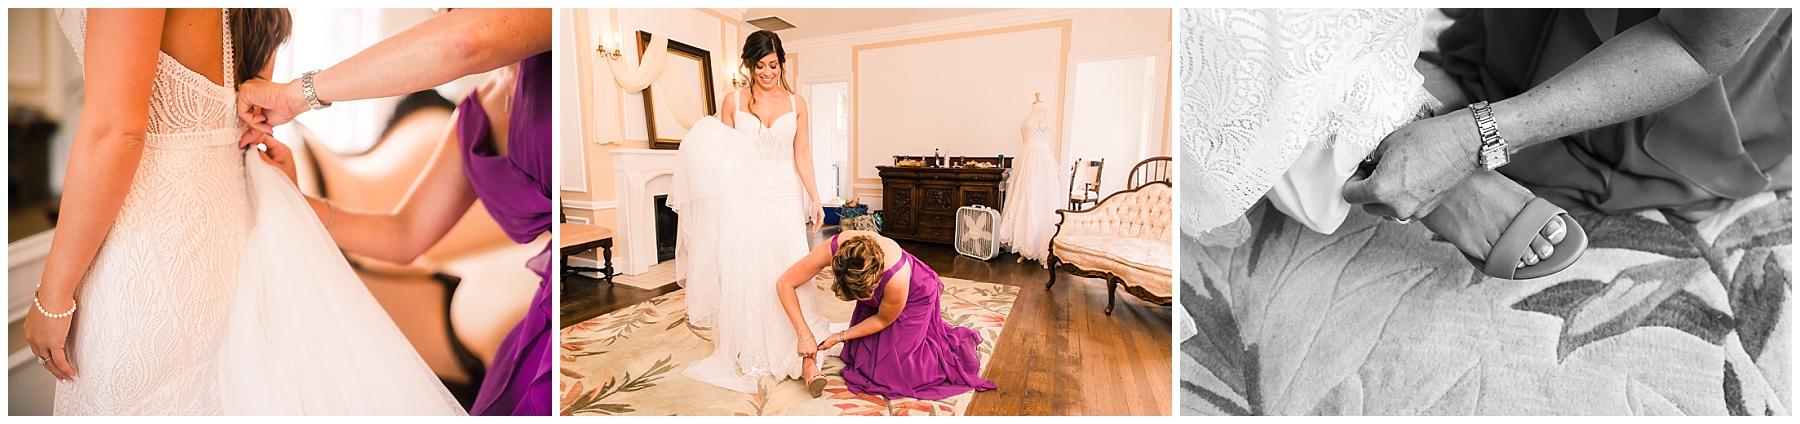 lafayette indiana wedding photography destination wedding fowler house mansion_0021.jpg